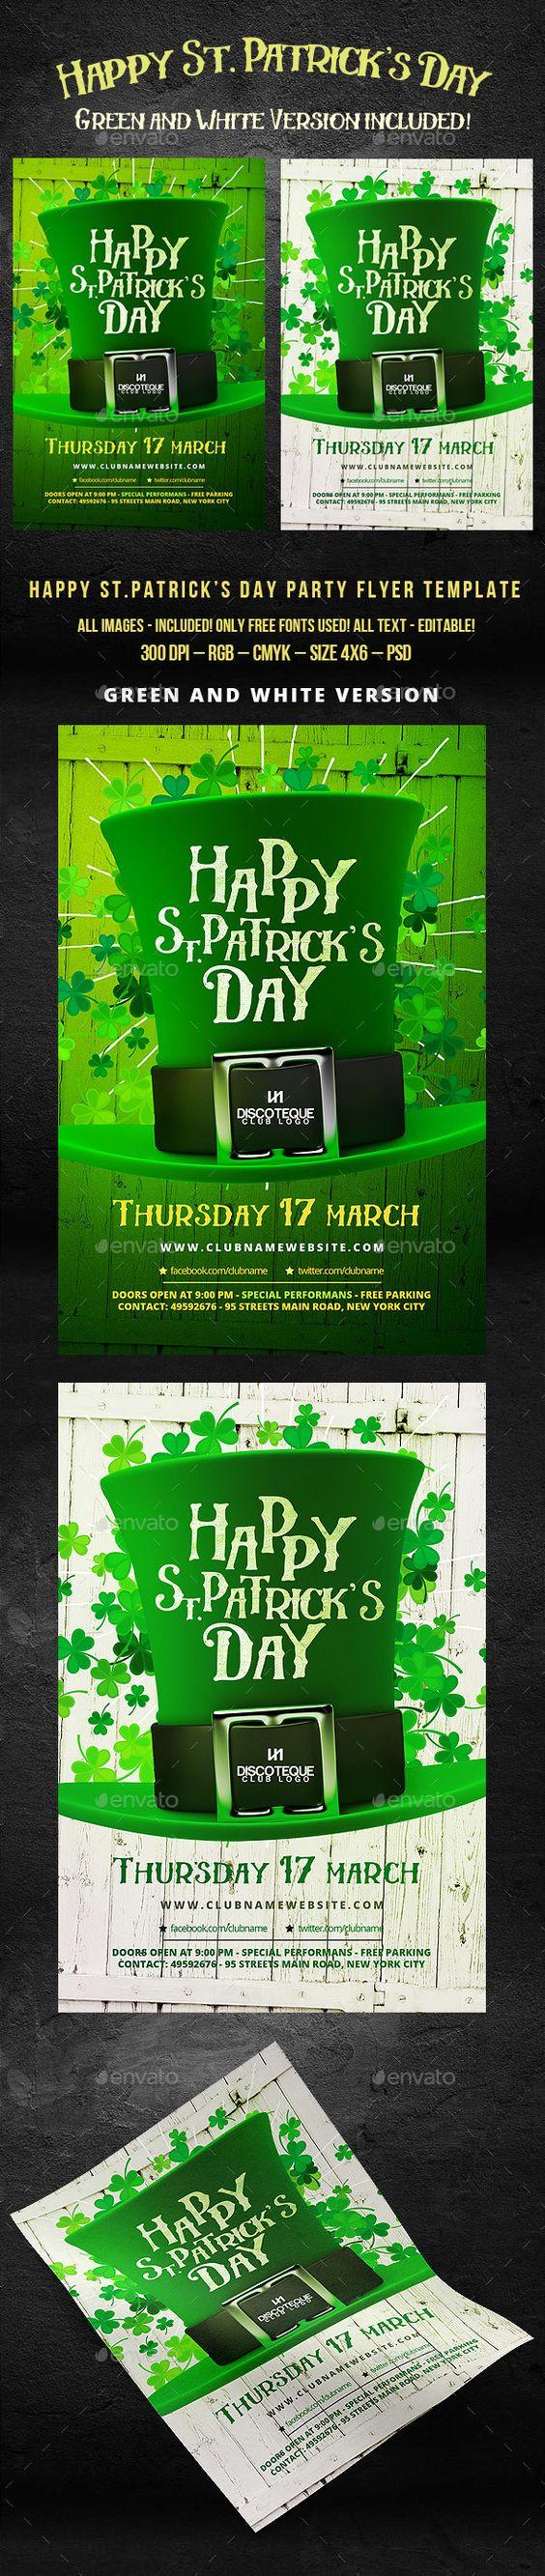 St. Patrick's Day Flyer #clover #ireland #irish #Irishparty #patricks #patricksday #SaintPatricksDay #St.Patrick'sDayFlyer Download it here: http://graphicriver.net/item/st-patricks-day-flyer/15356202?ref=